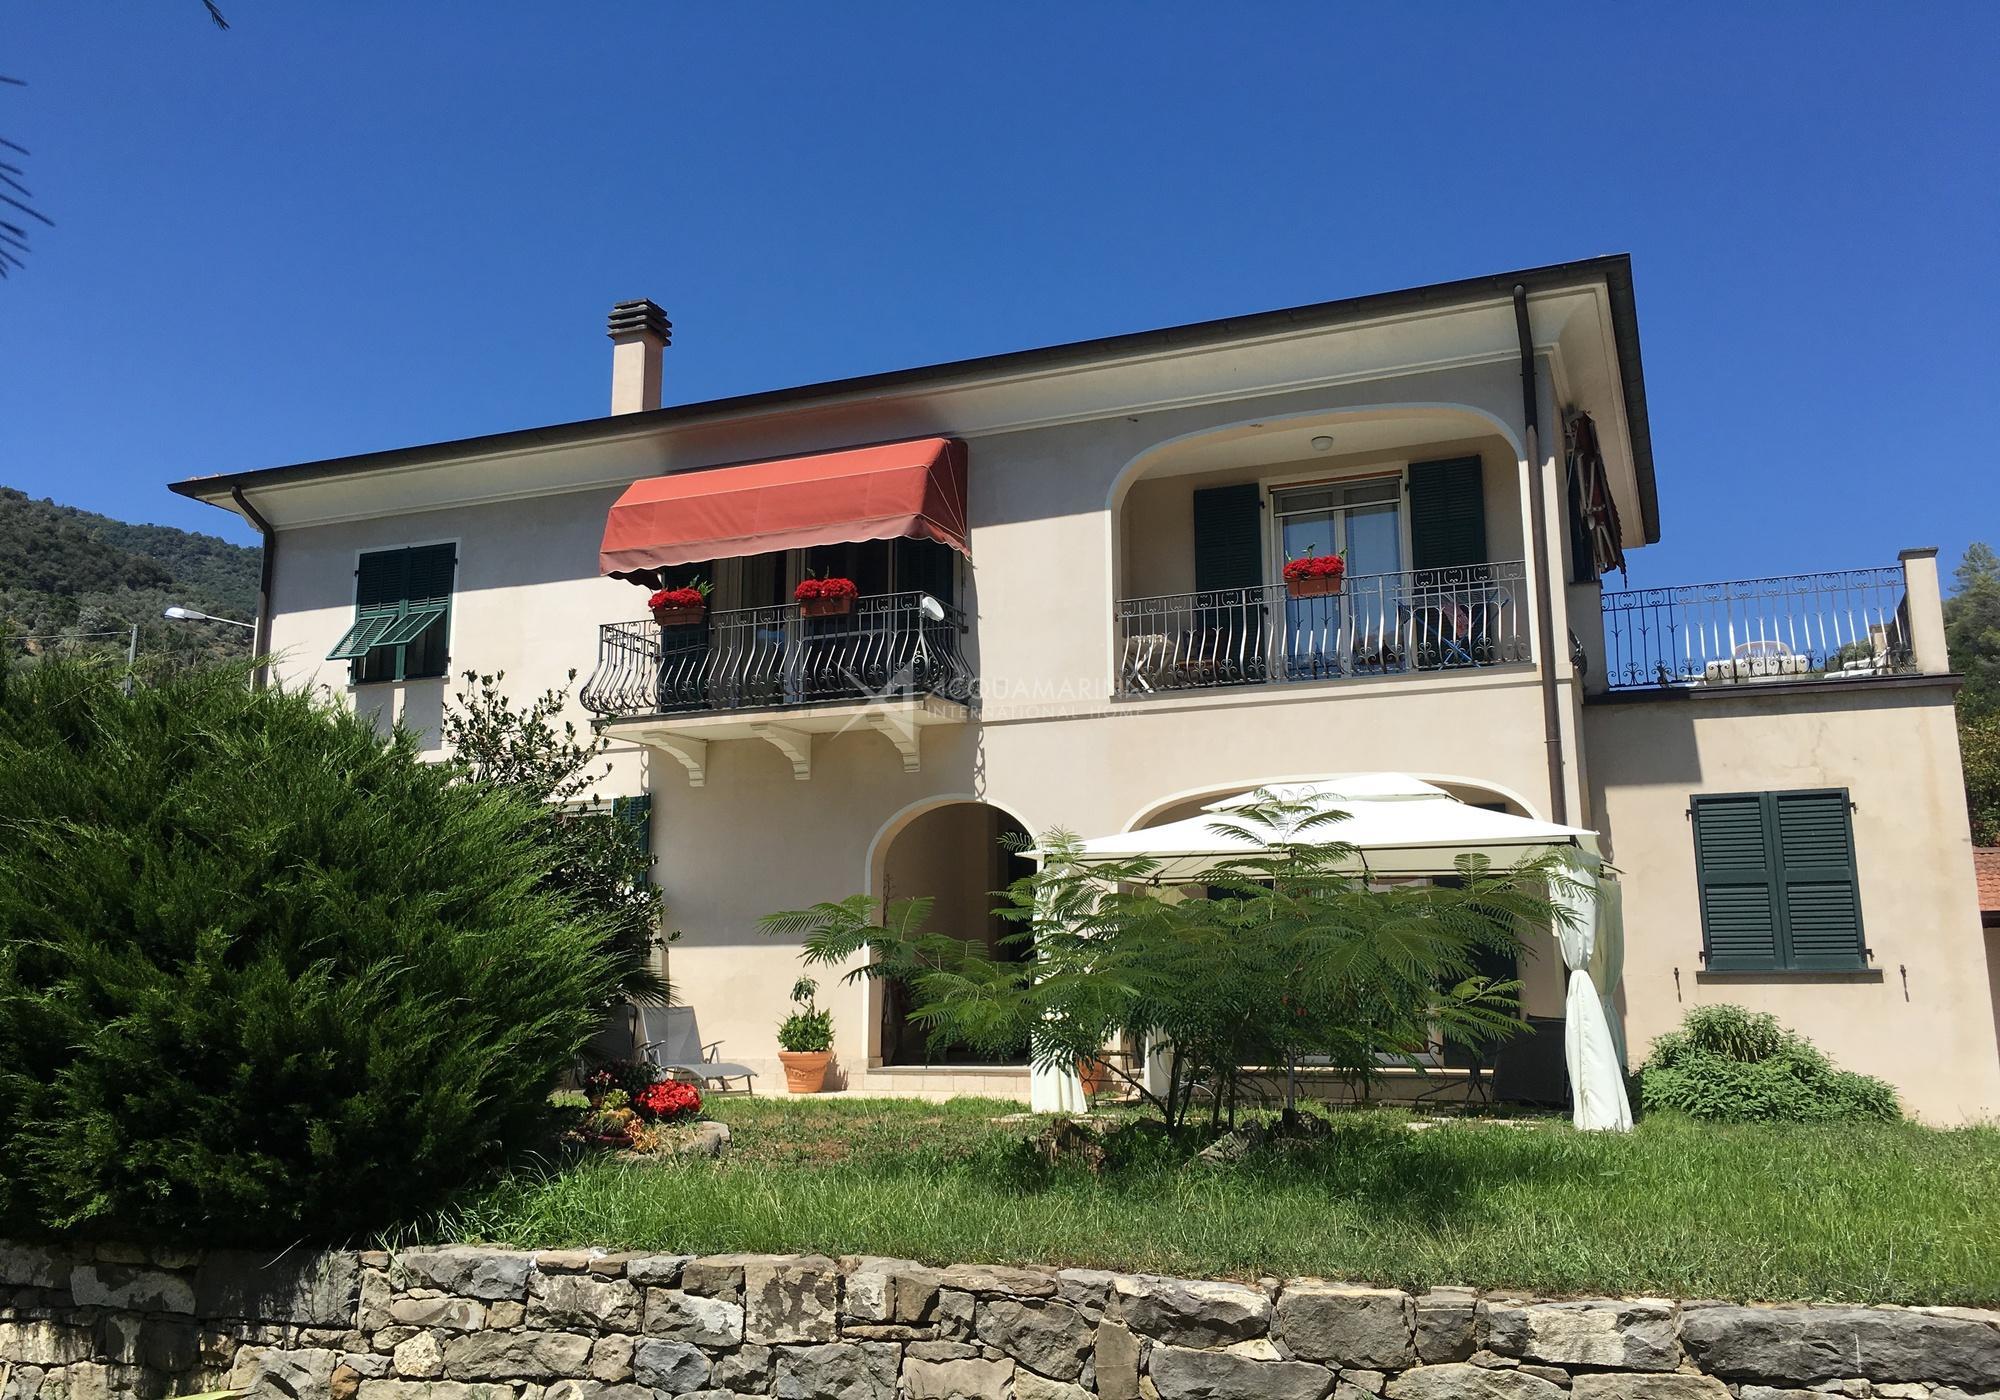 Isolabona Villa<br />1/8